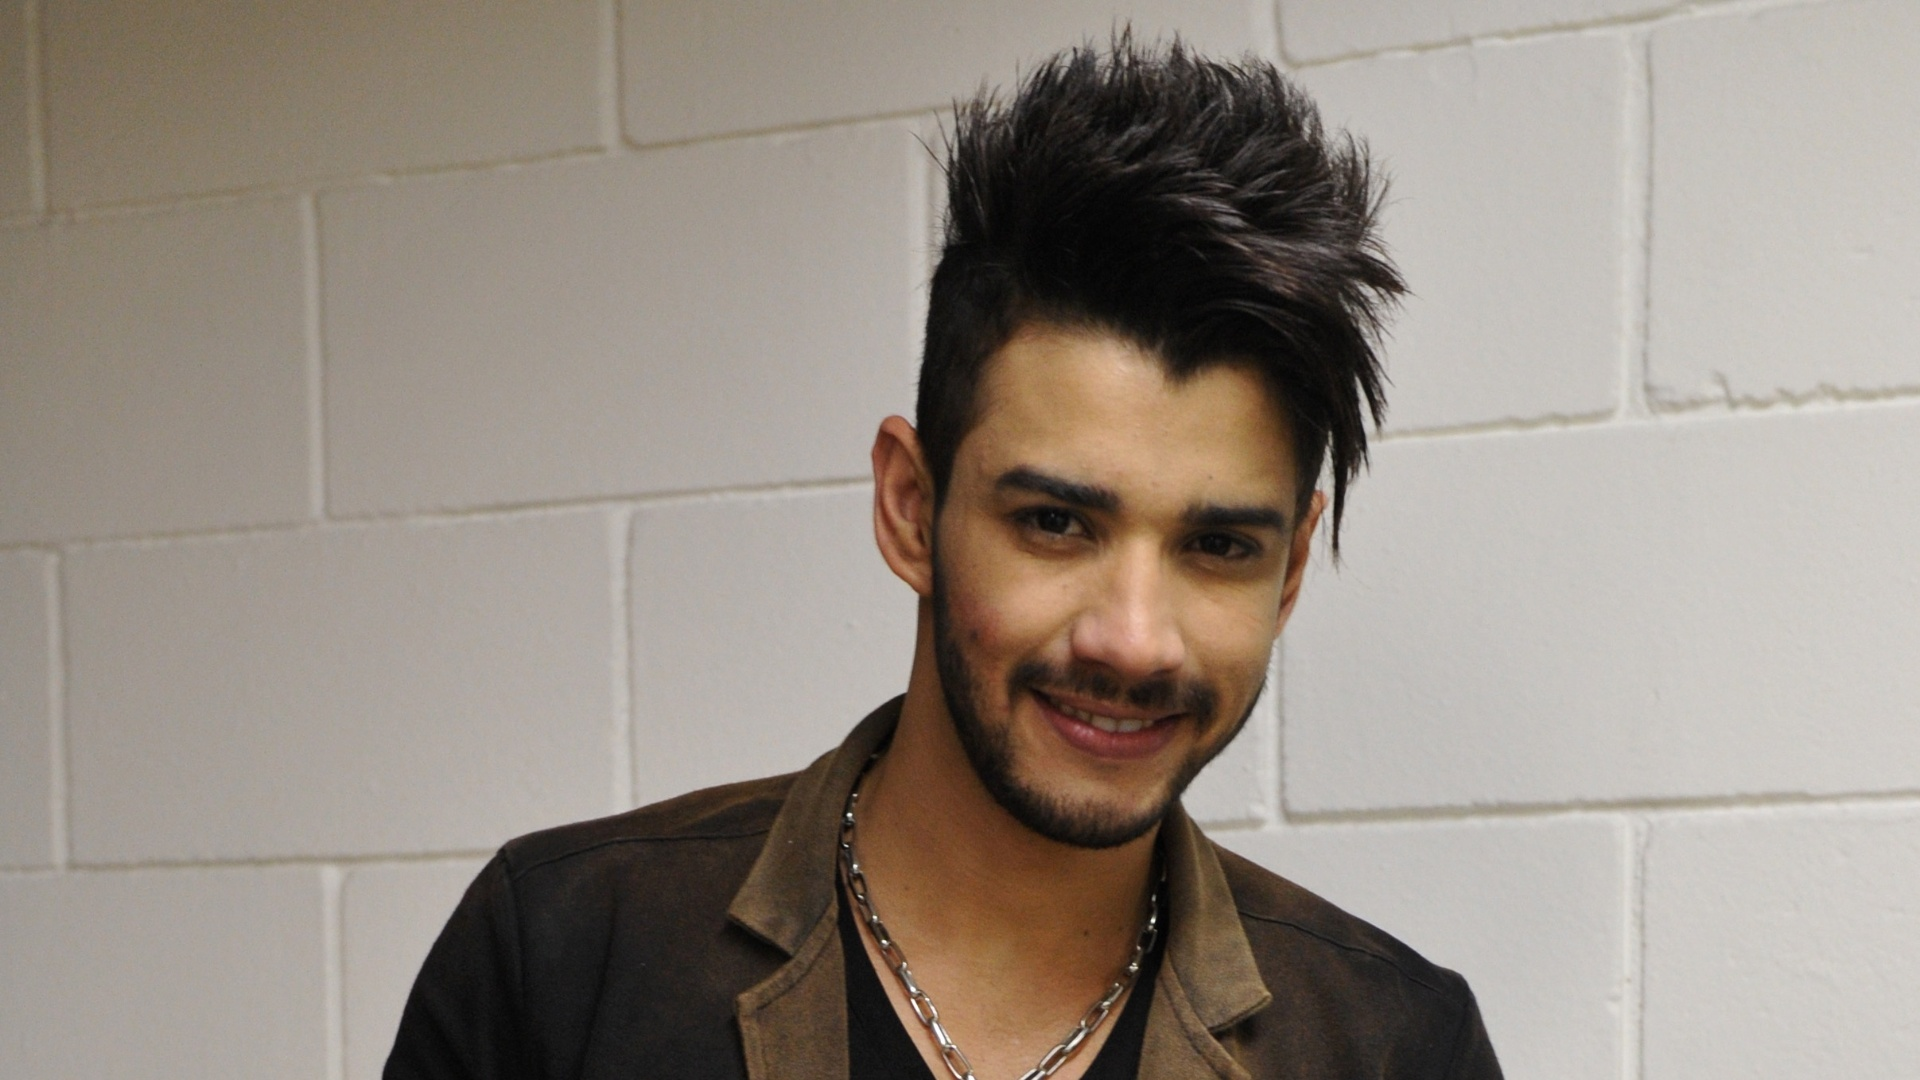 O cantor Gusttavo Lima participa do programa